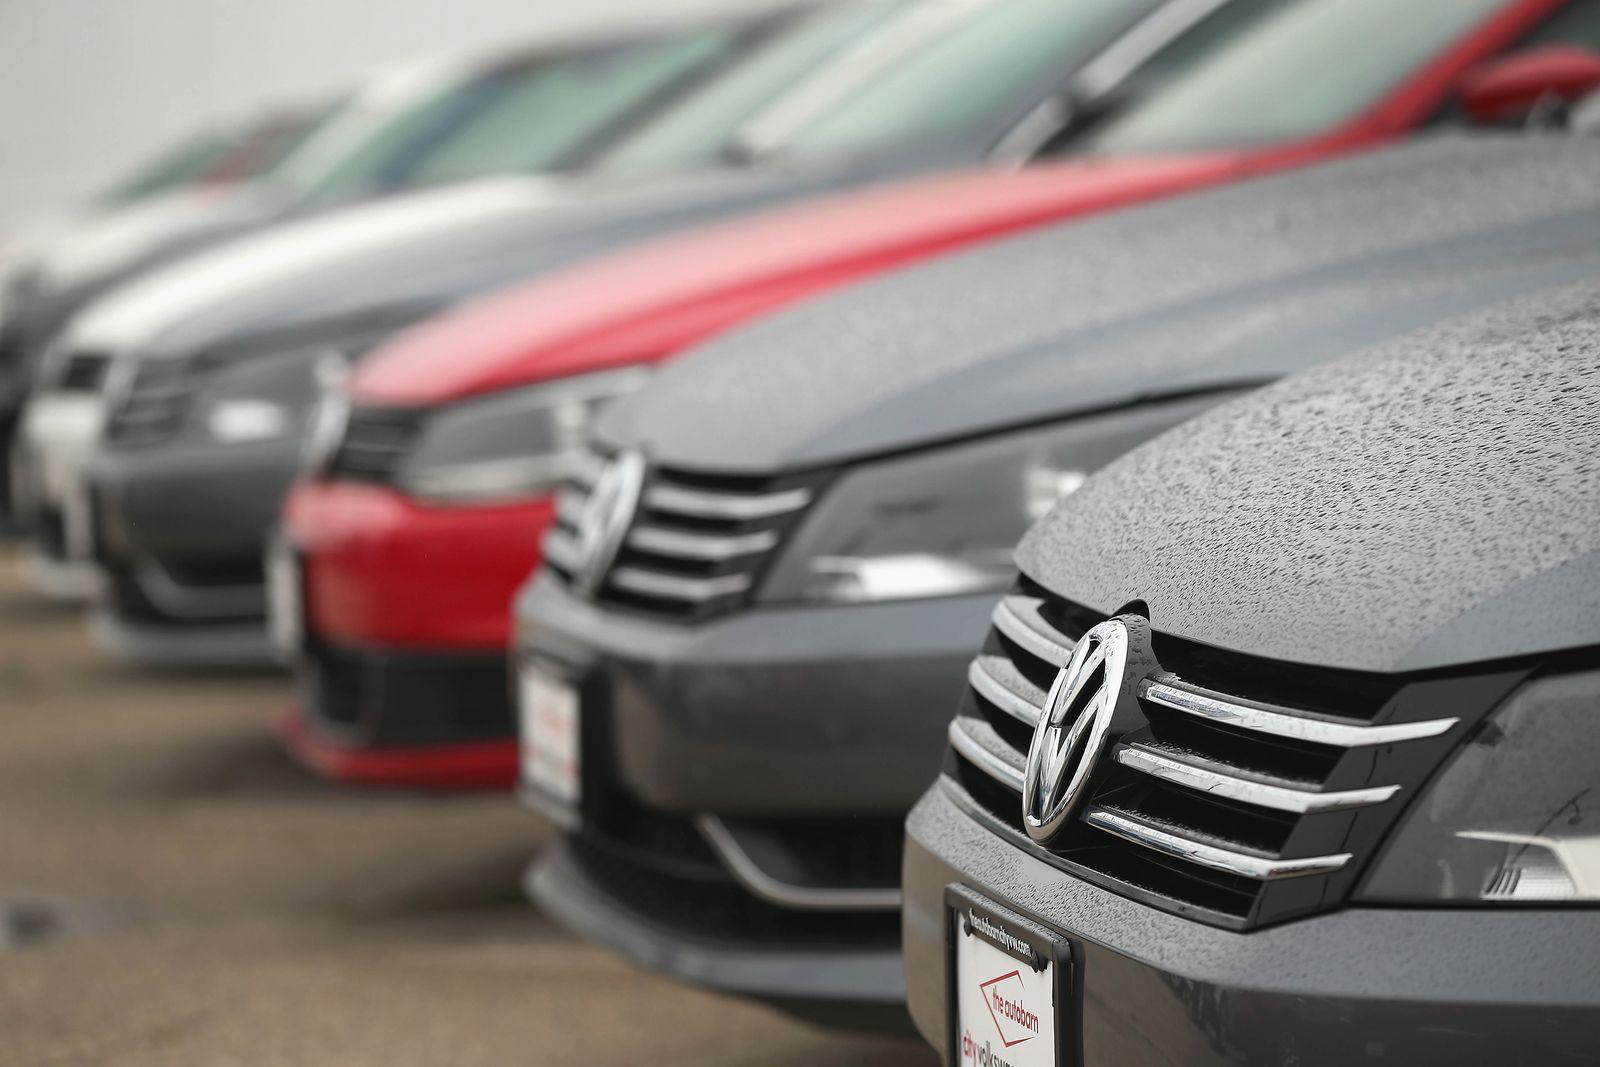 VW / Kurssturz